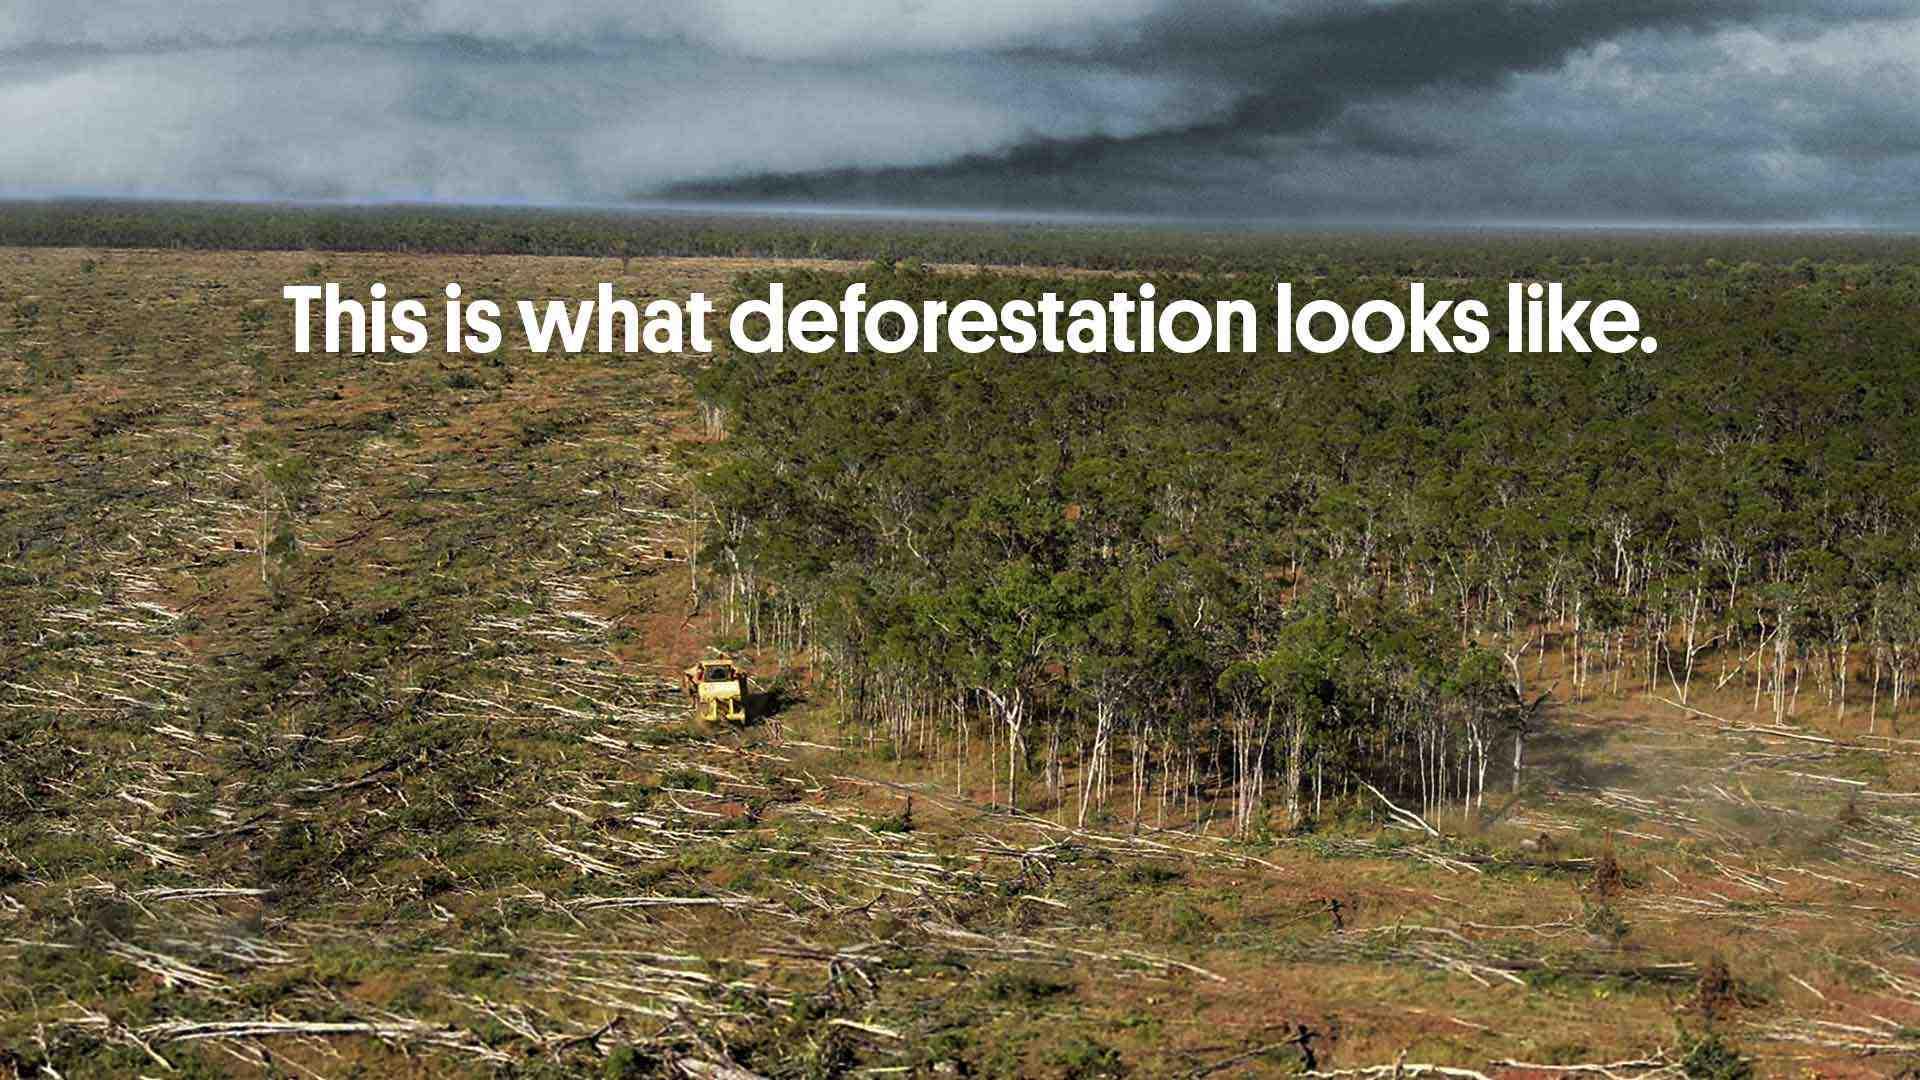 deforestation wilderness society